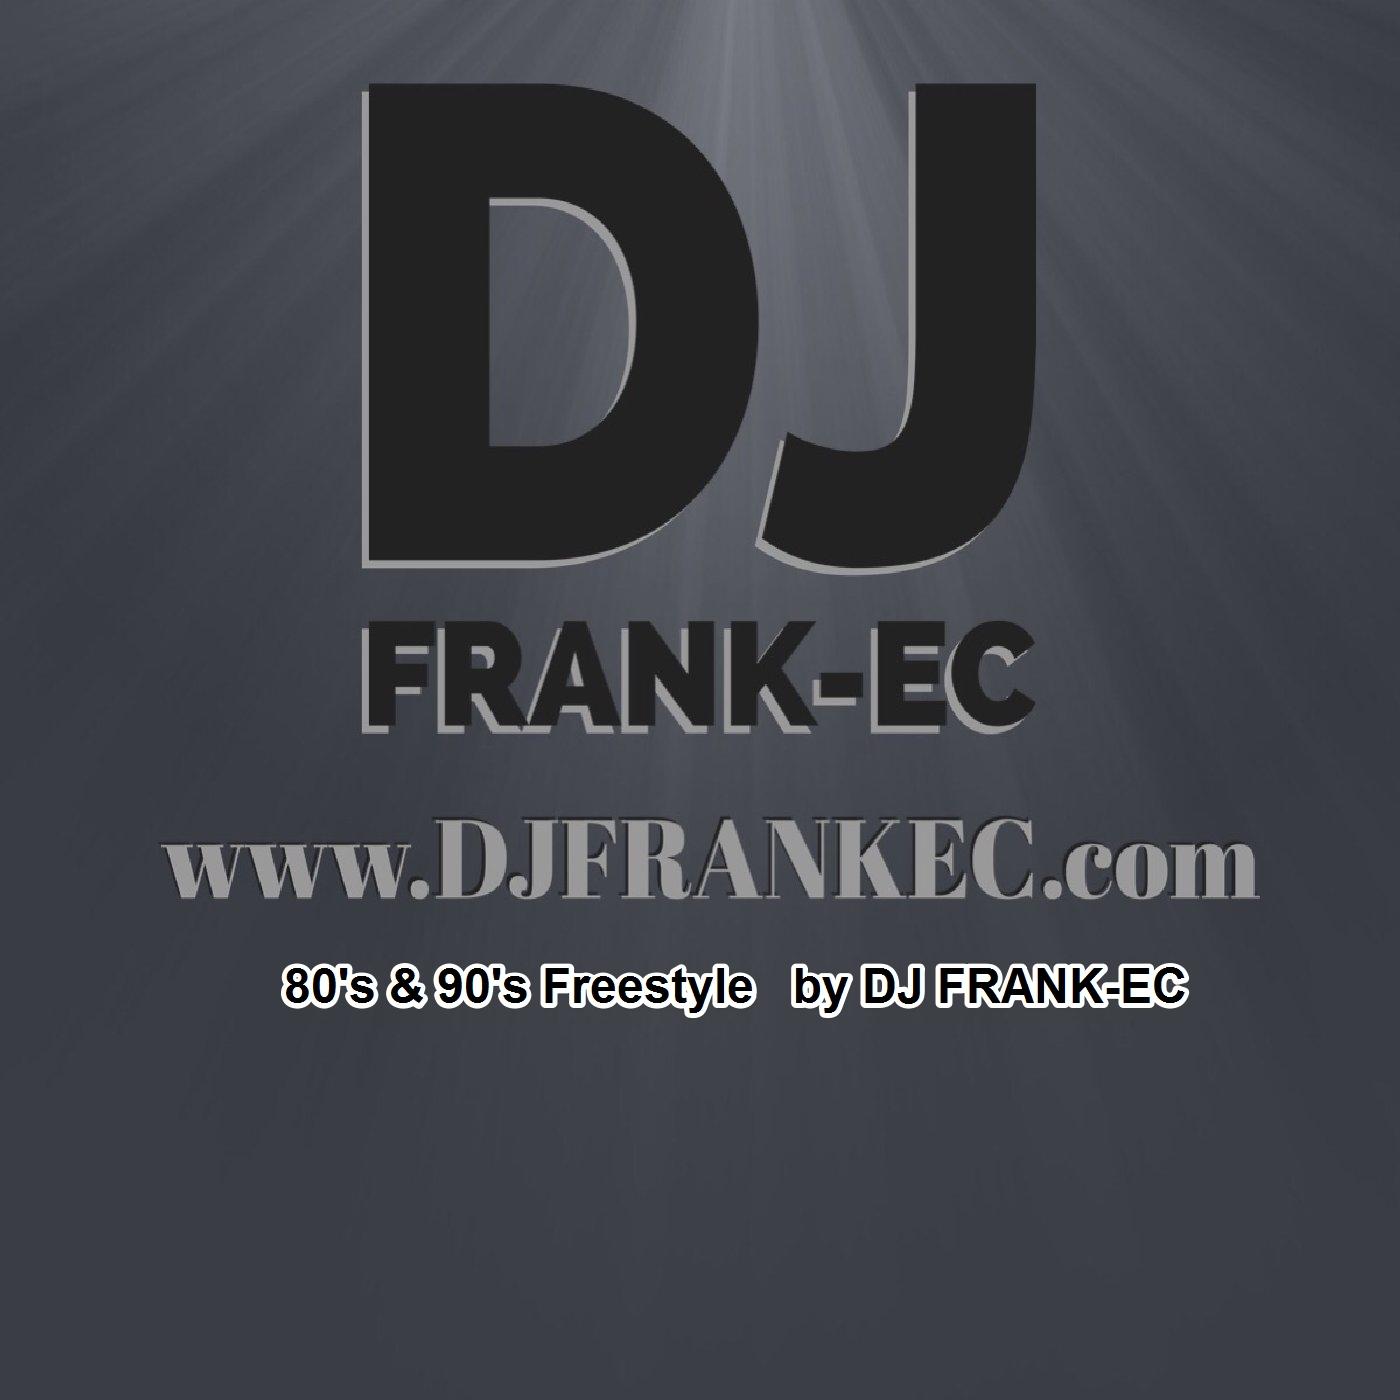 80's & 90's Freestyle - DJ Frank-EC